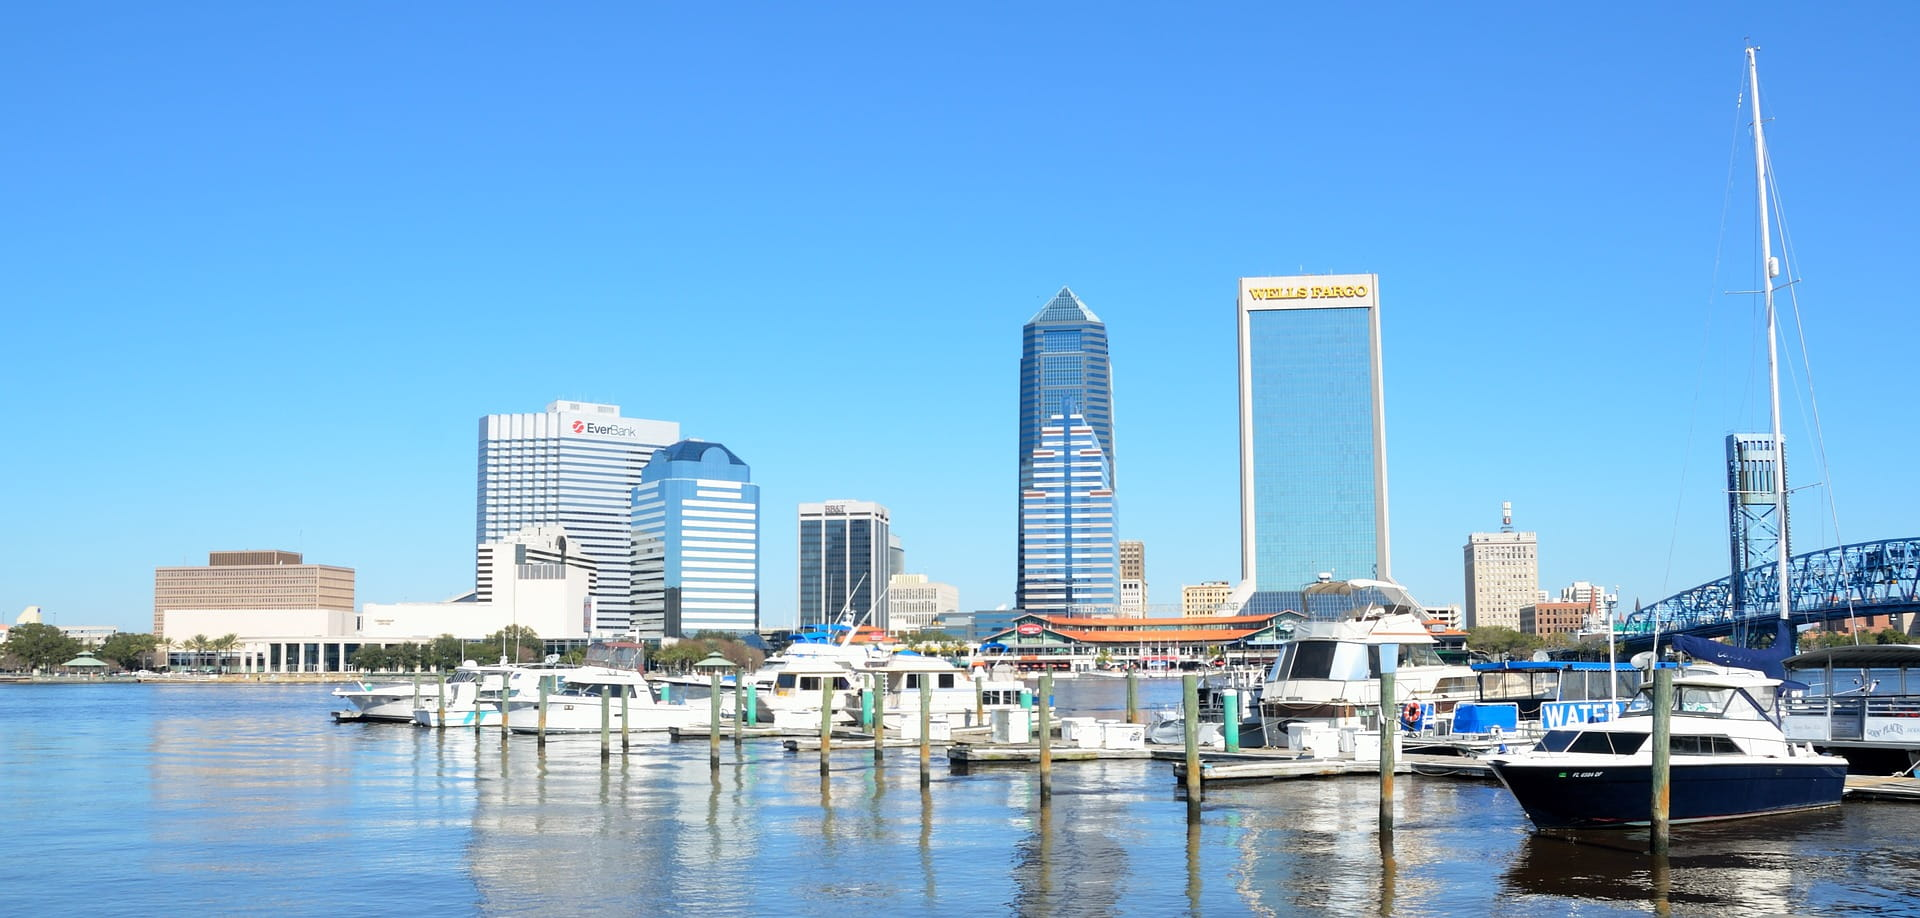 iBuyer Presence Grows in Jacksonville, Florida